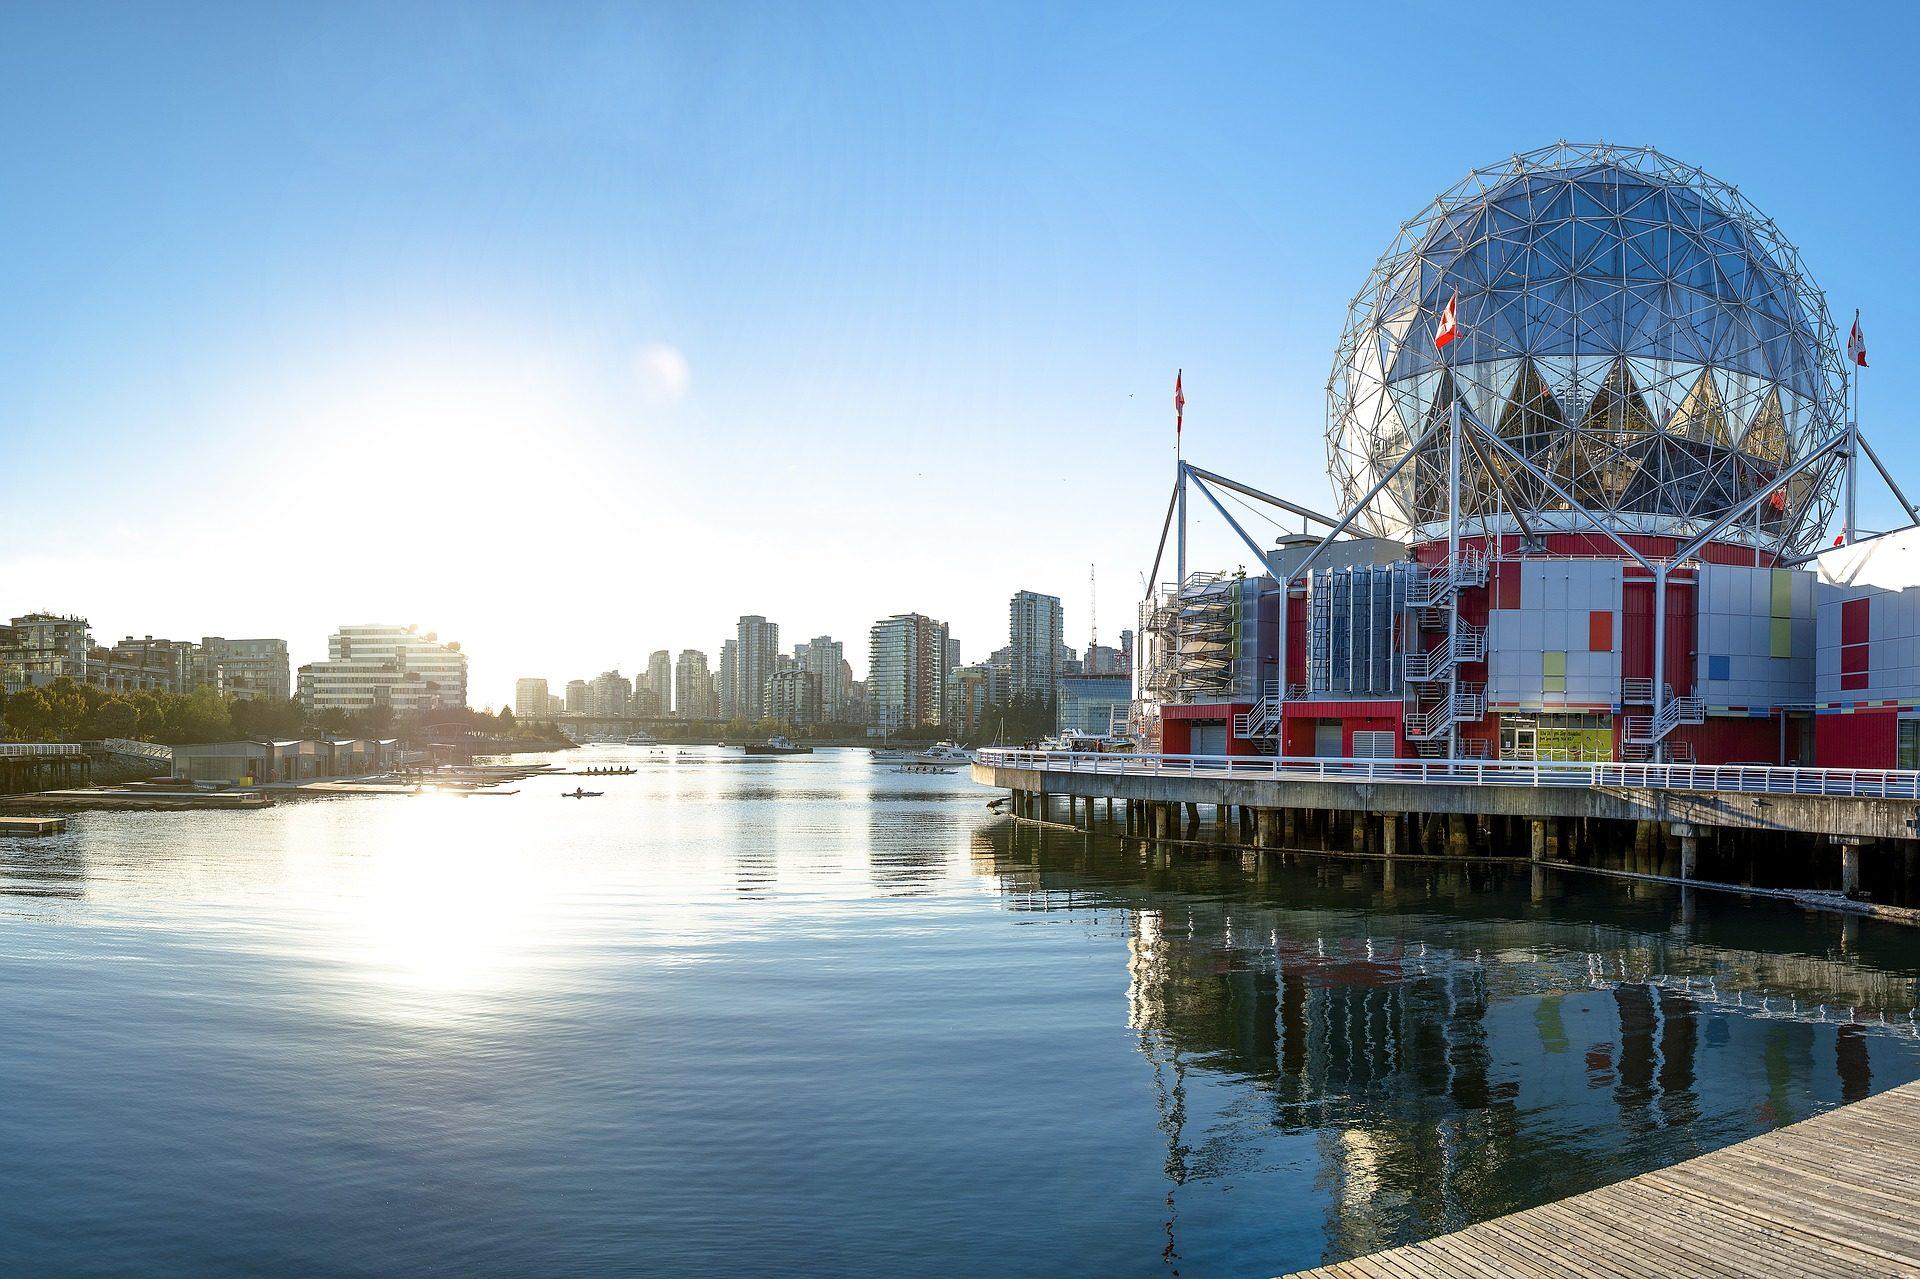 संग्रहालय, विज्ञान, वास्तुकला, शहर, वैंकूवर, कनाडा - HD वॉलपेपर - प्रोफेसर-falken.com